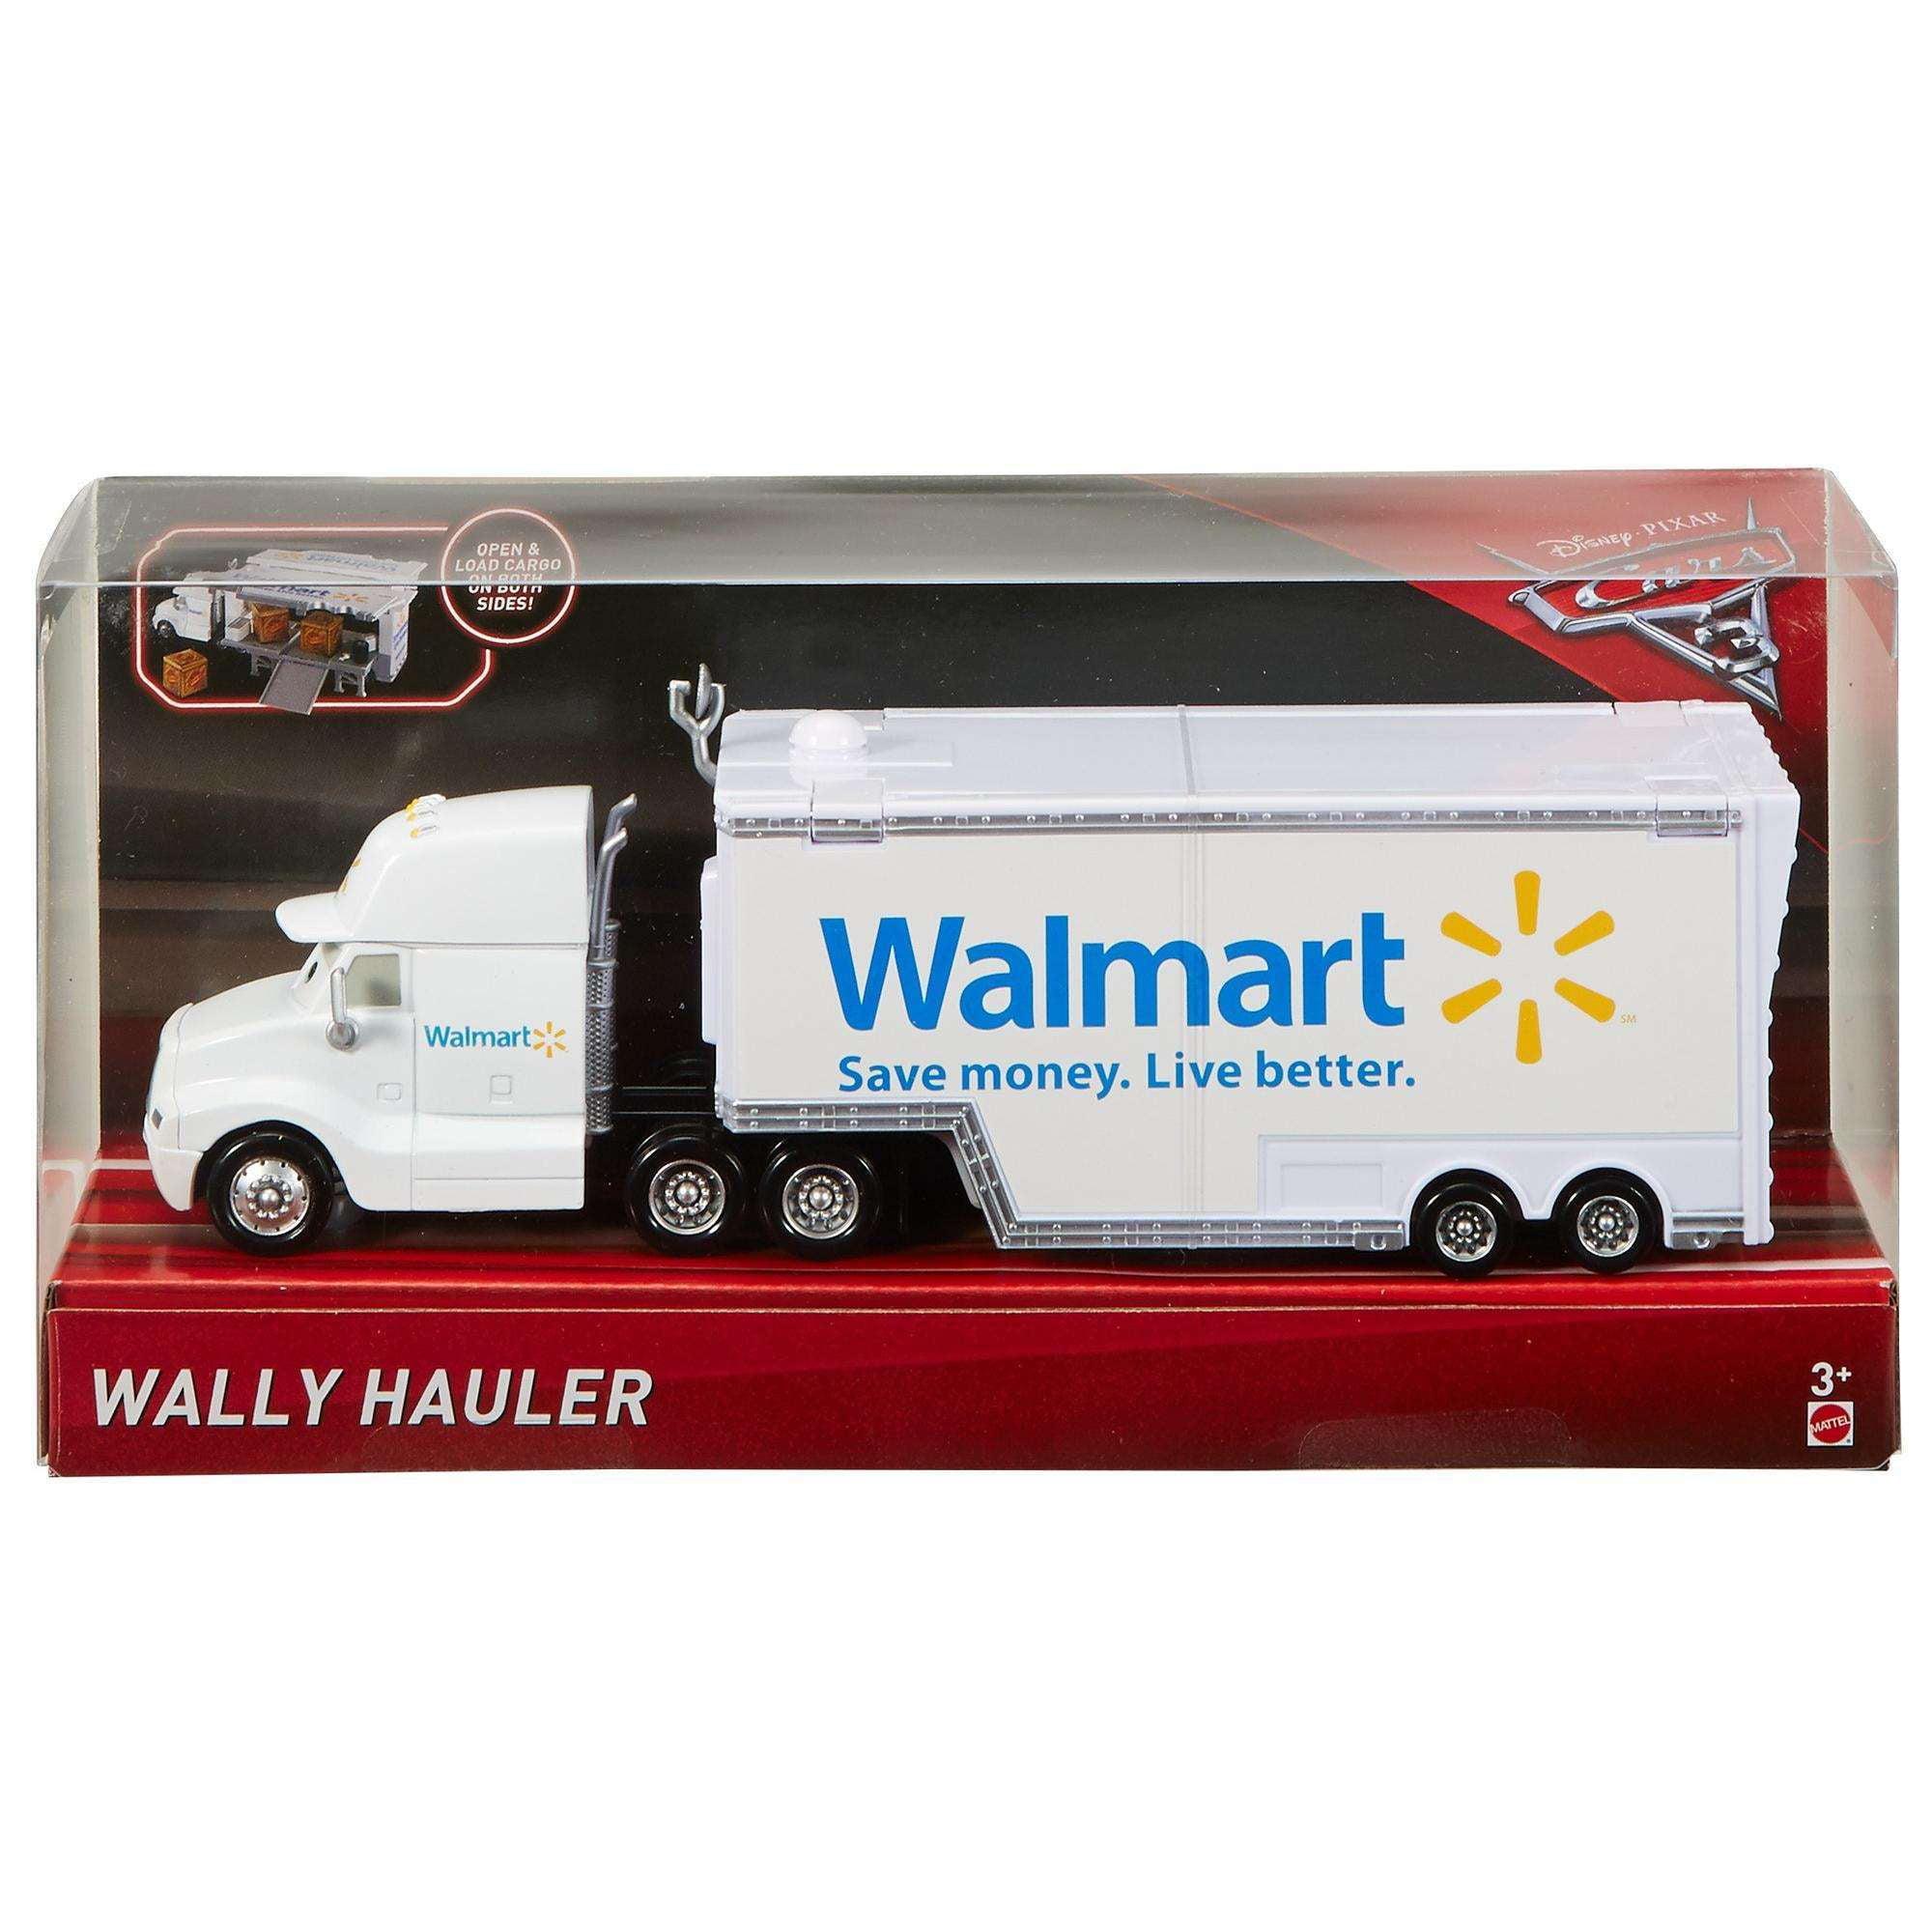 Disney Pixar Cars Wally Hauler